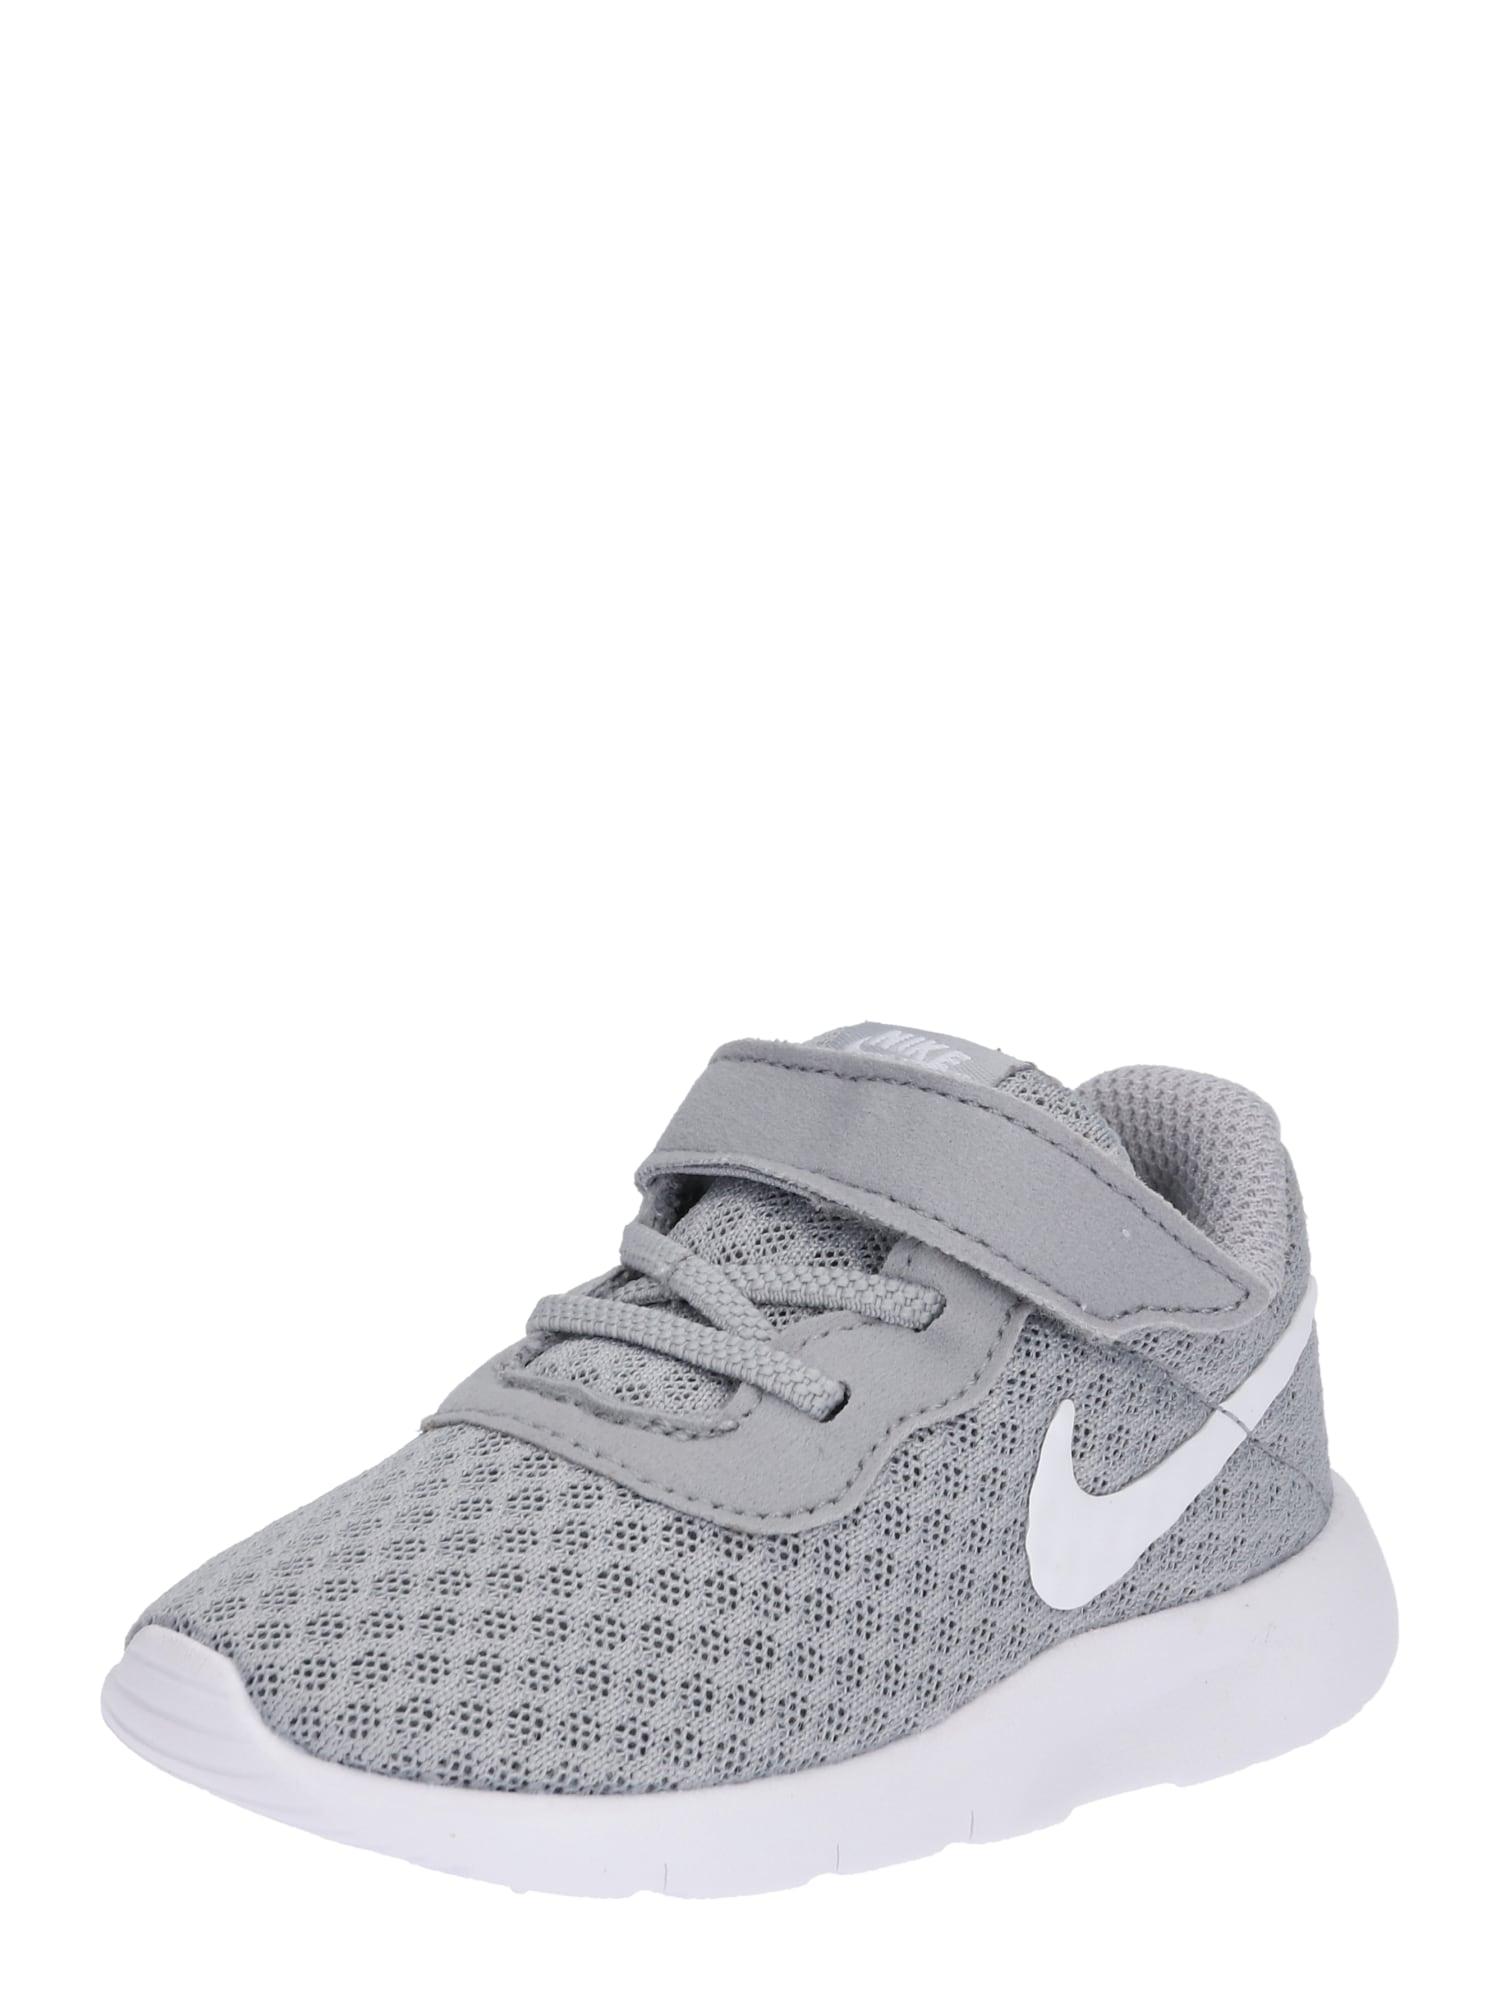 NIKE Sportiniai batai 'Tanjun Toddler' pilka / balta